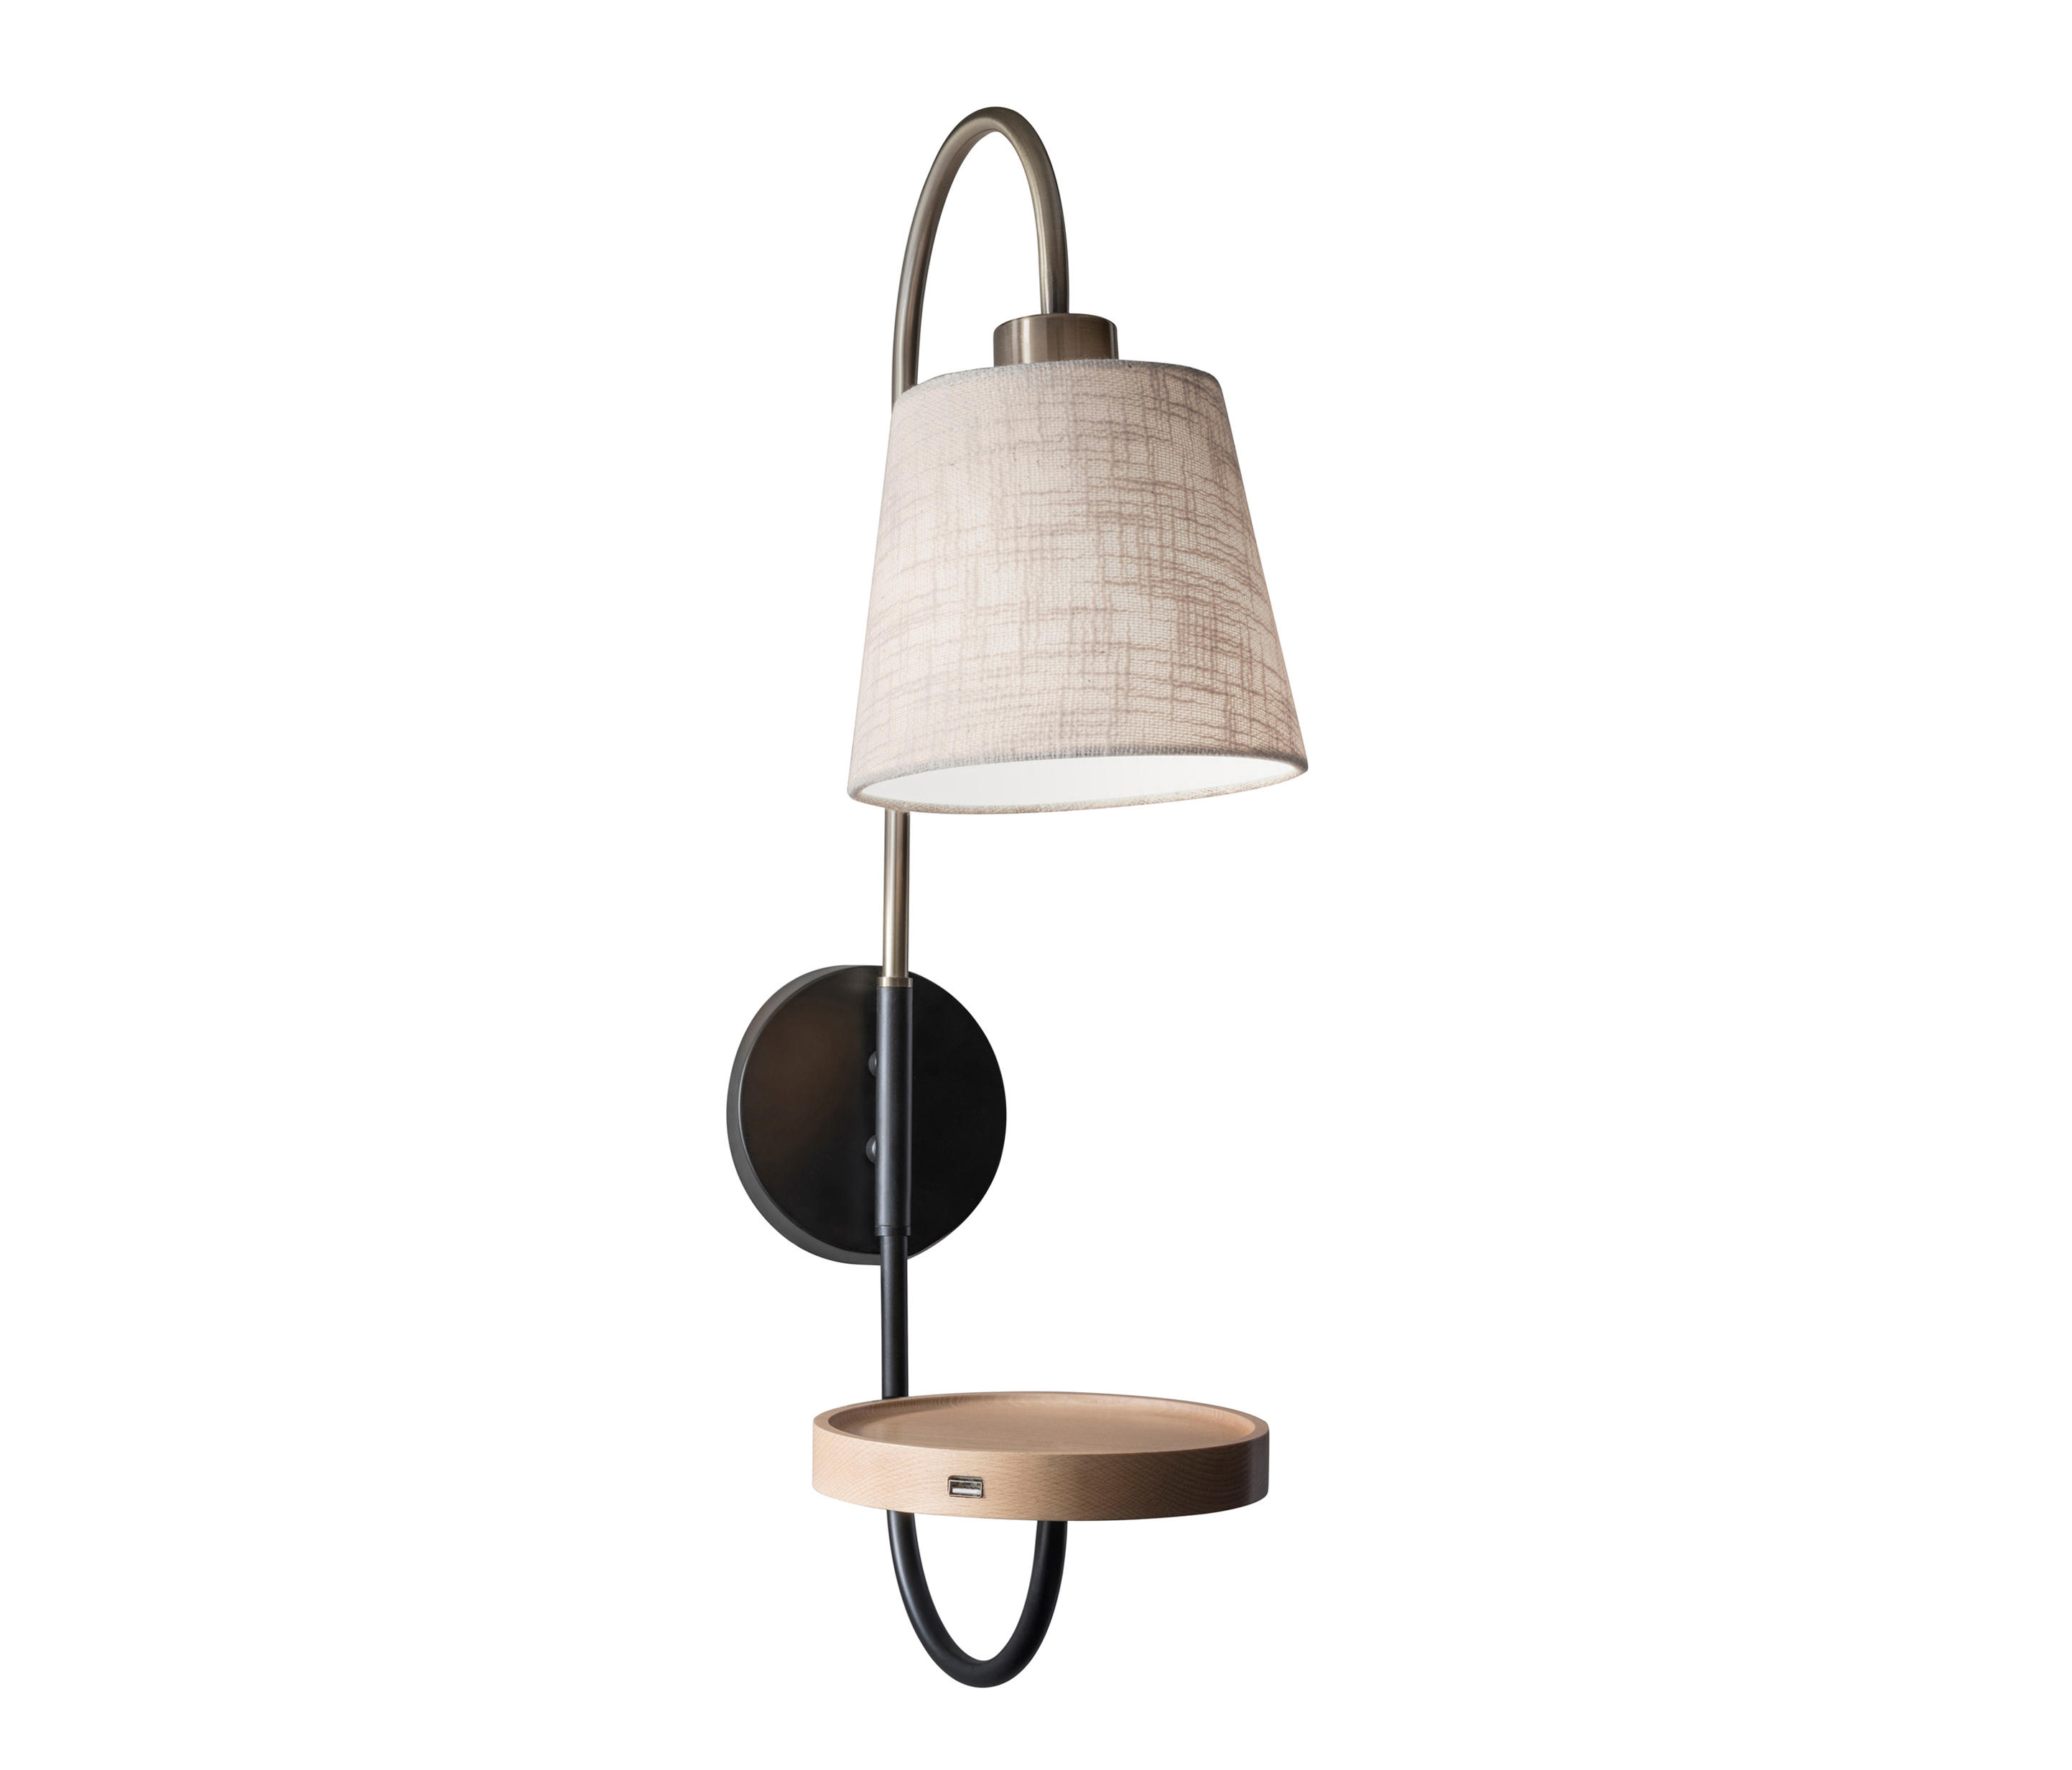 Jeff Wall Light Bulbs : JEFFREY WALL LAMP - General lighting from ADS360 Architonic